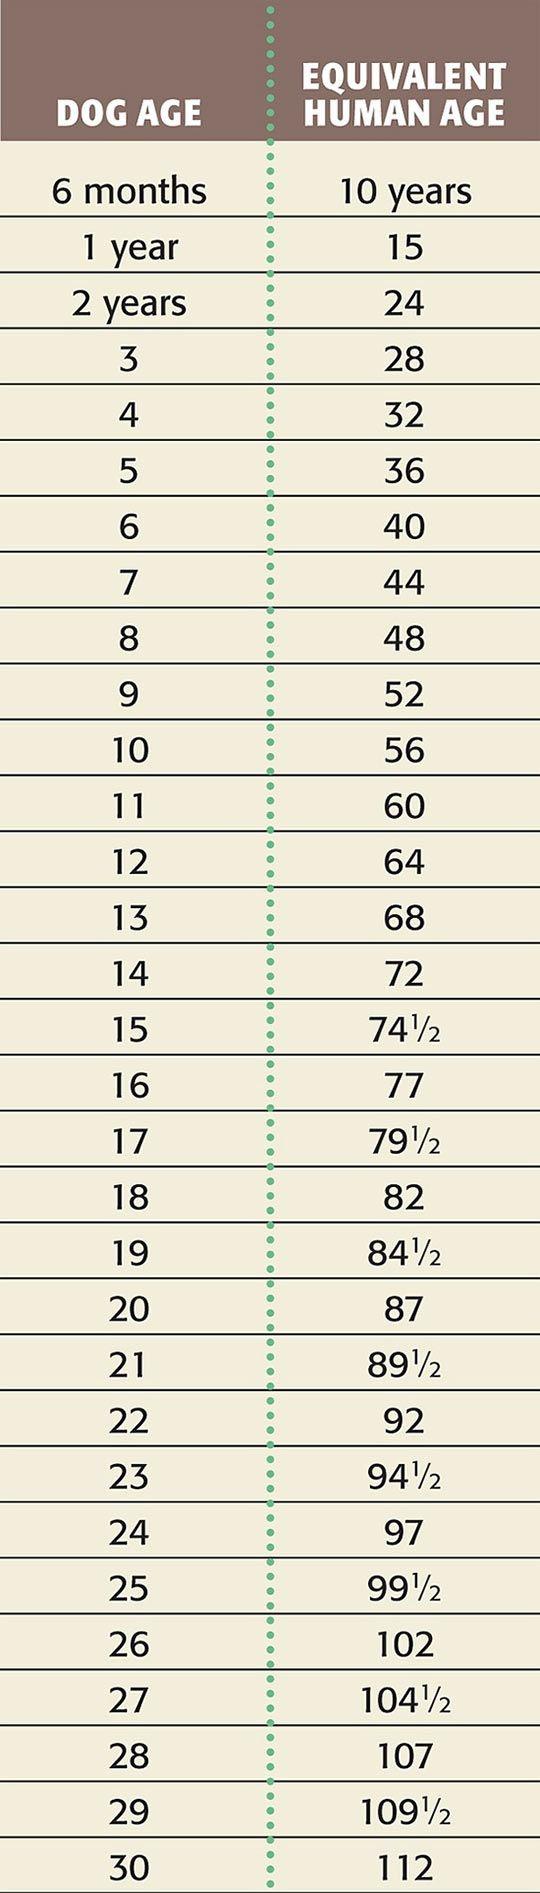 Dog age vs human age.